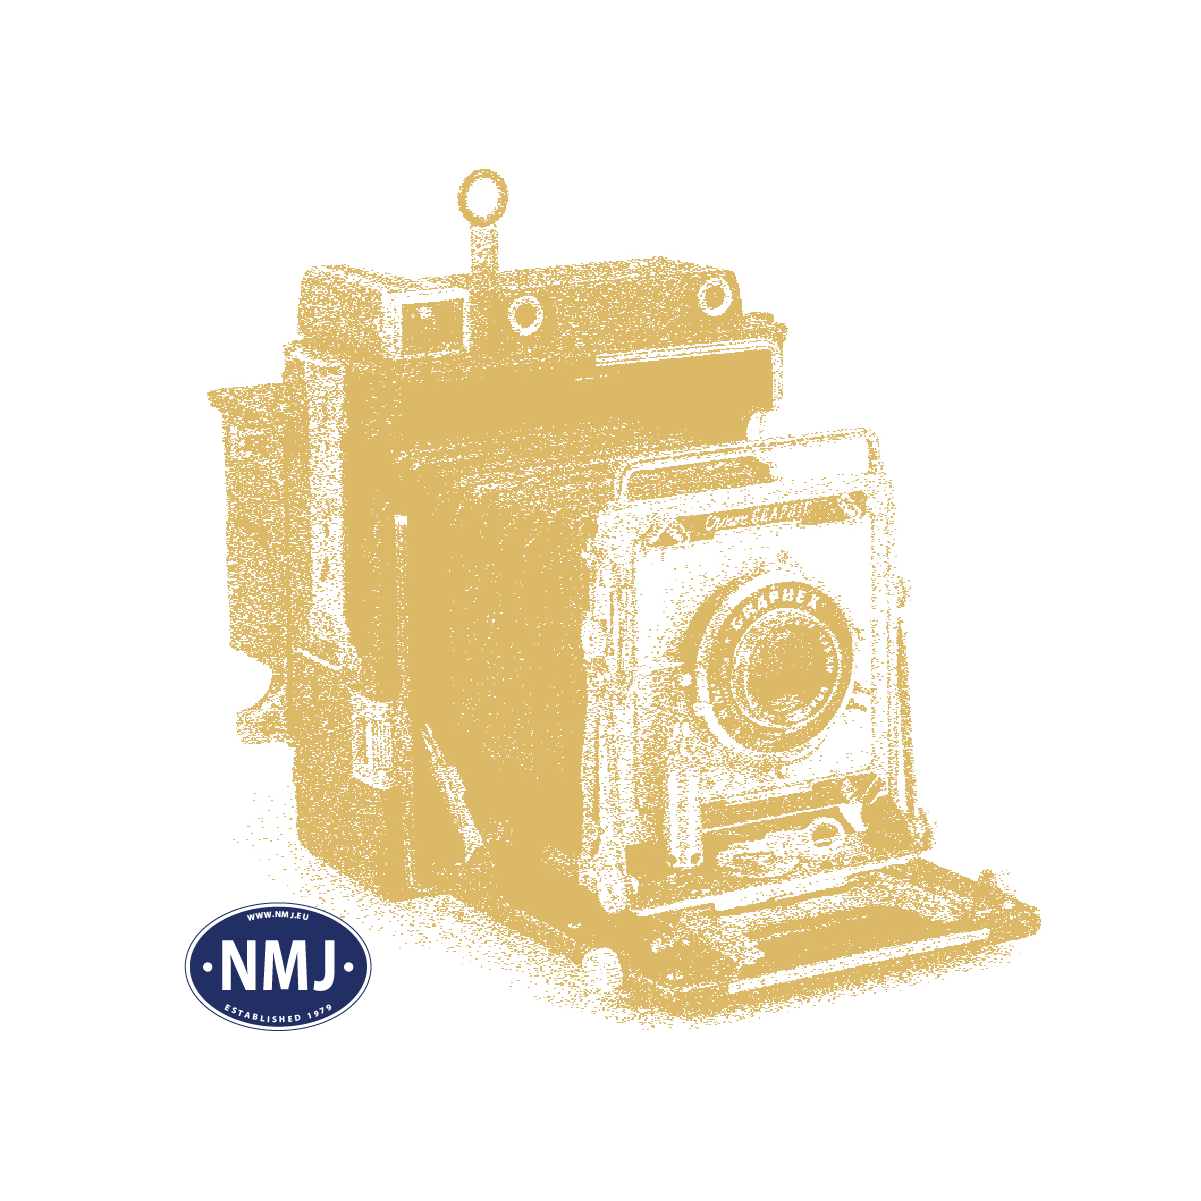 MIN717-21S - Gresstuster, Kort utgave, Vår, H0